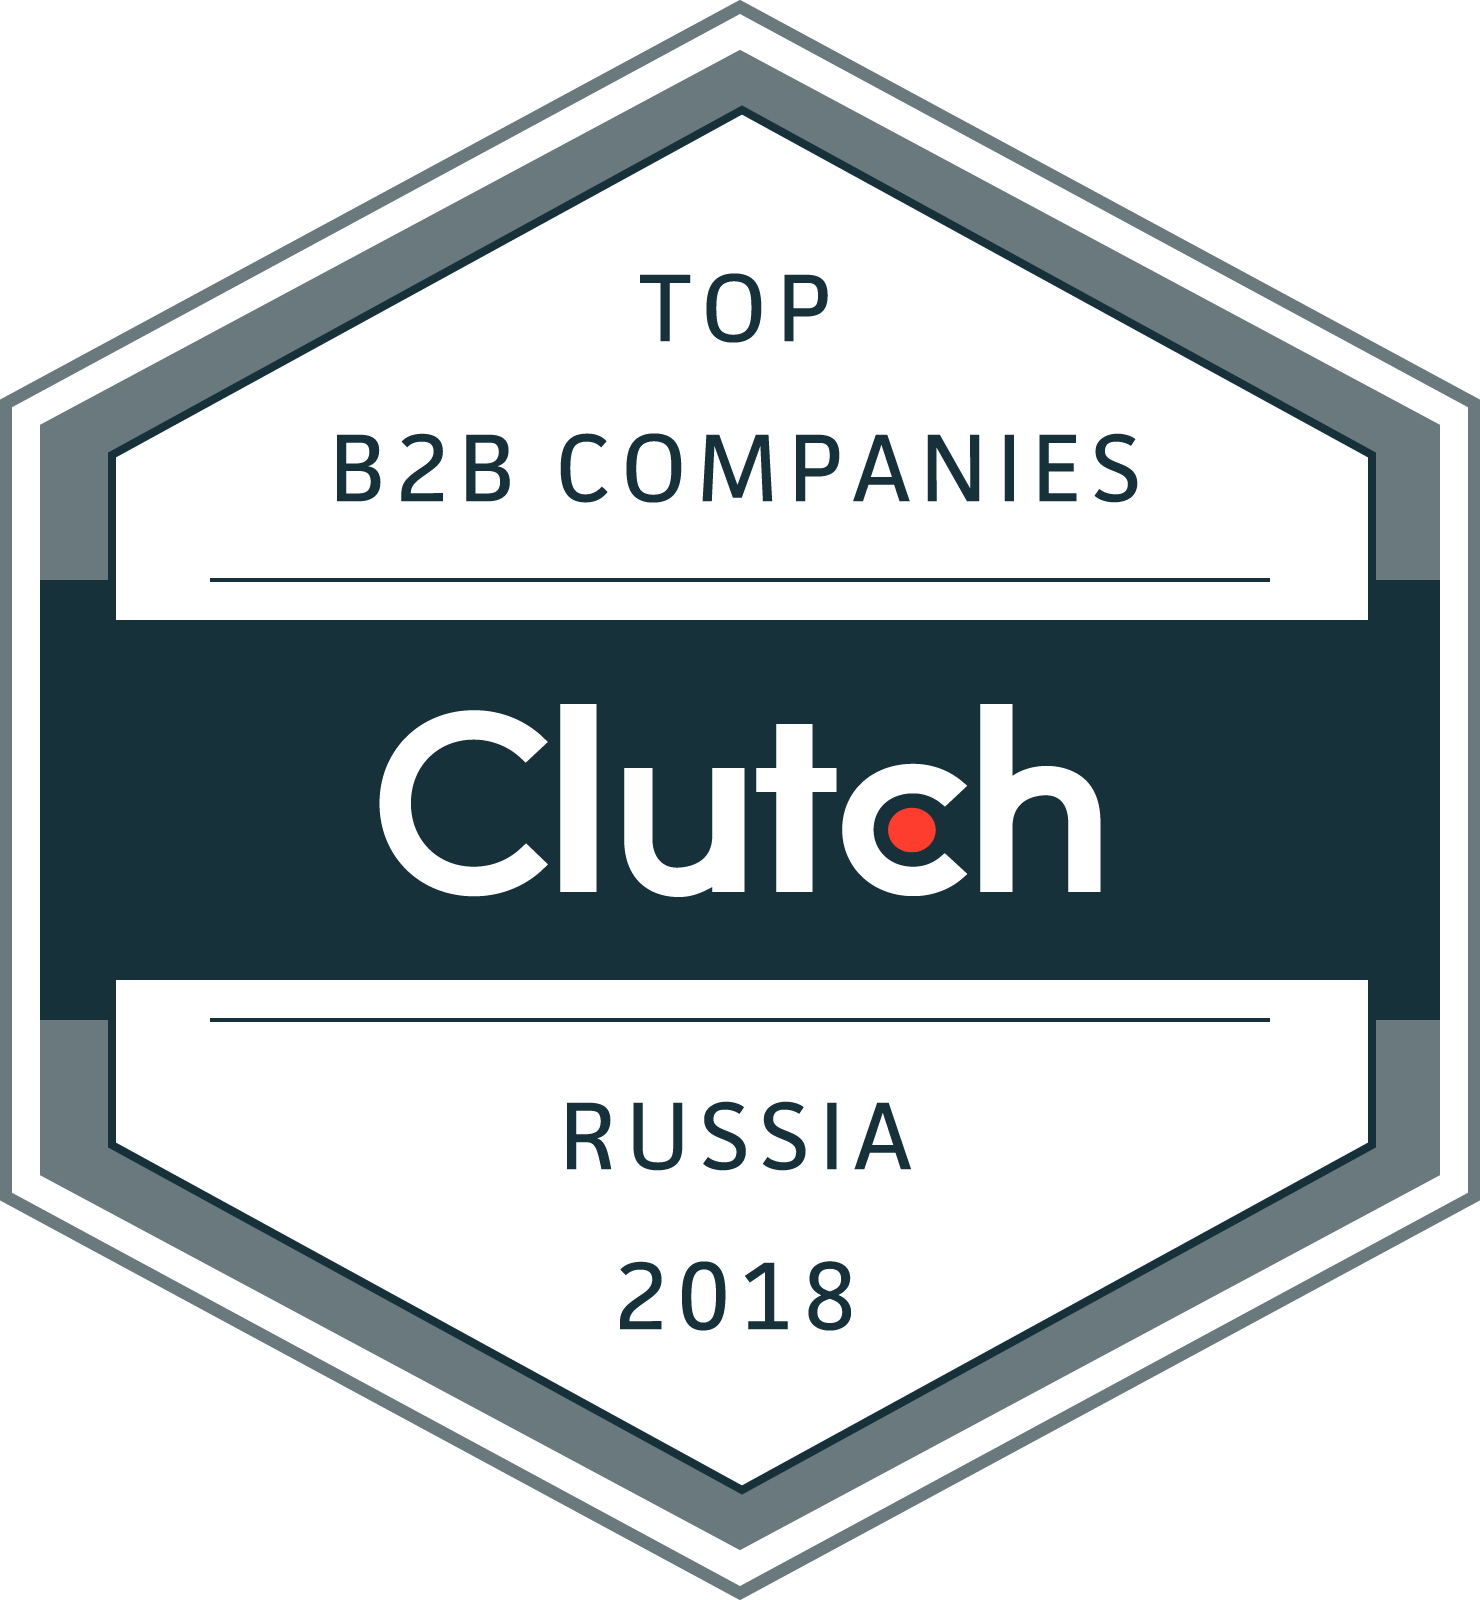 TOP B2B Companies Russia 2018